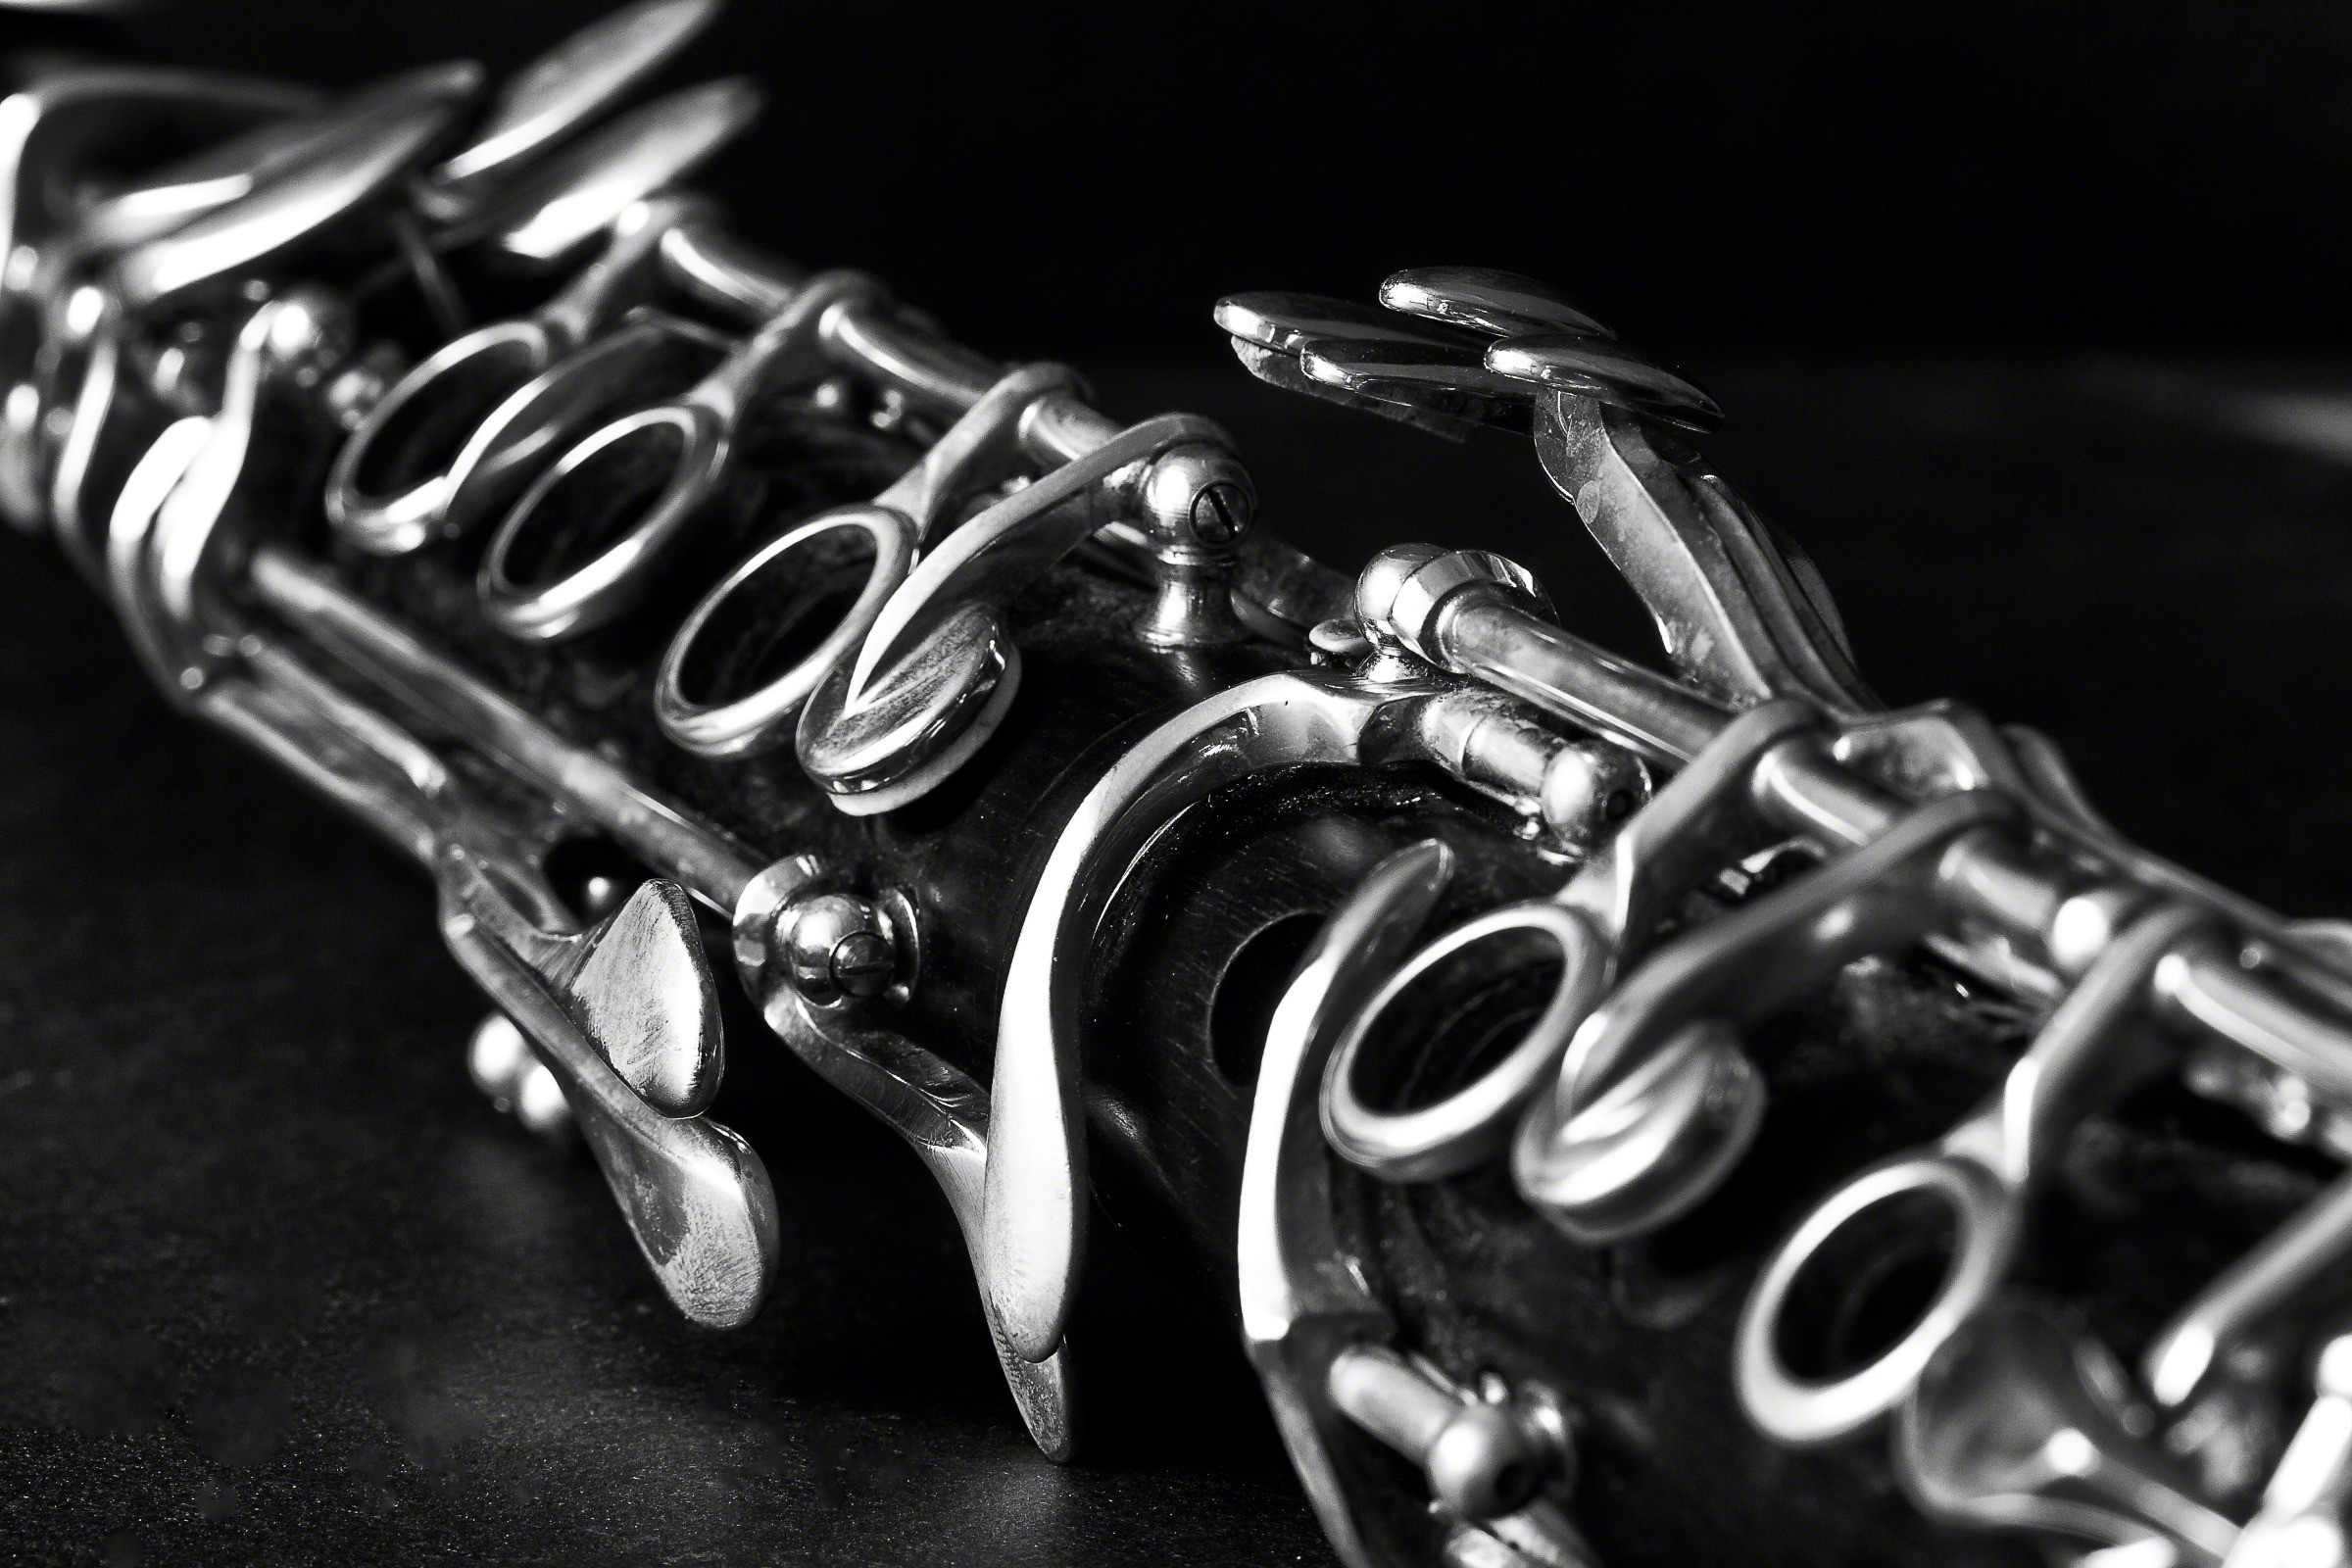 2400x1600 Flute Djembe Drum Clarinet